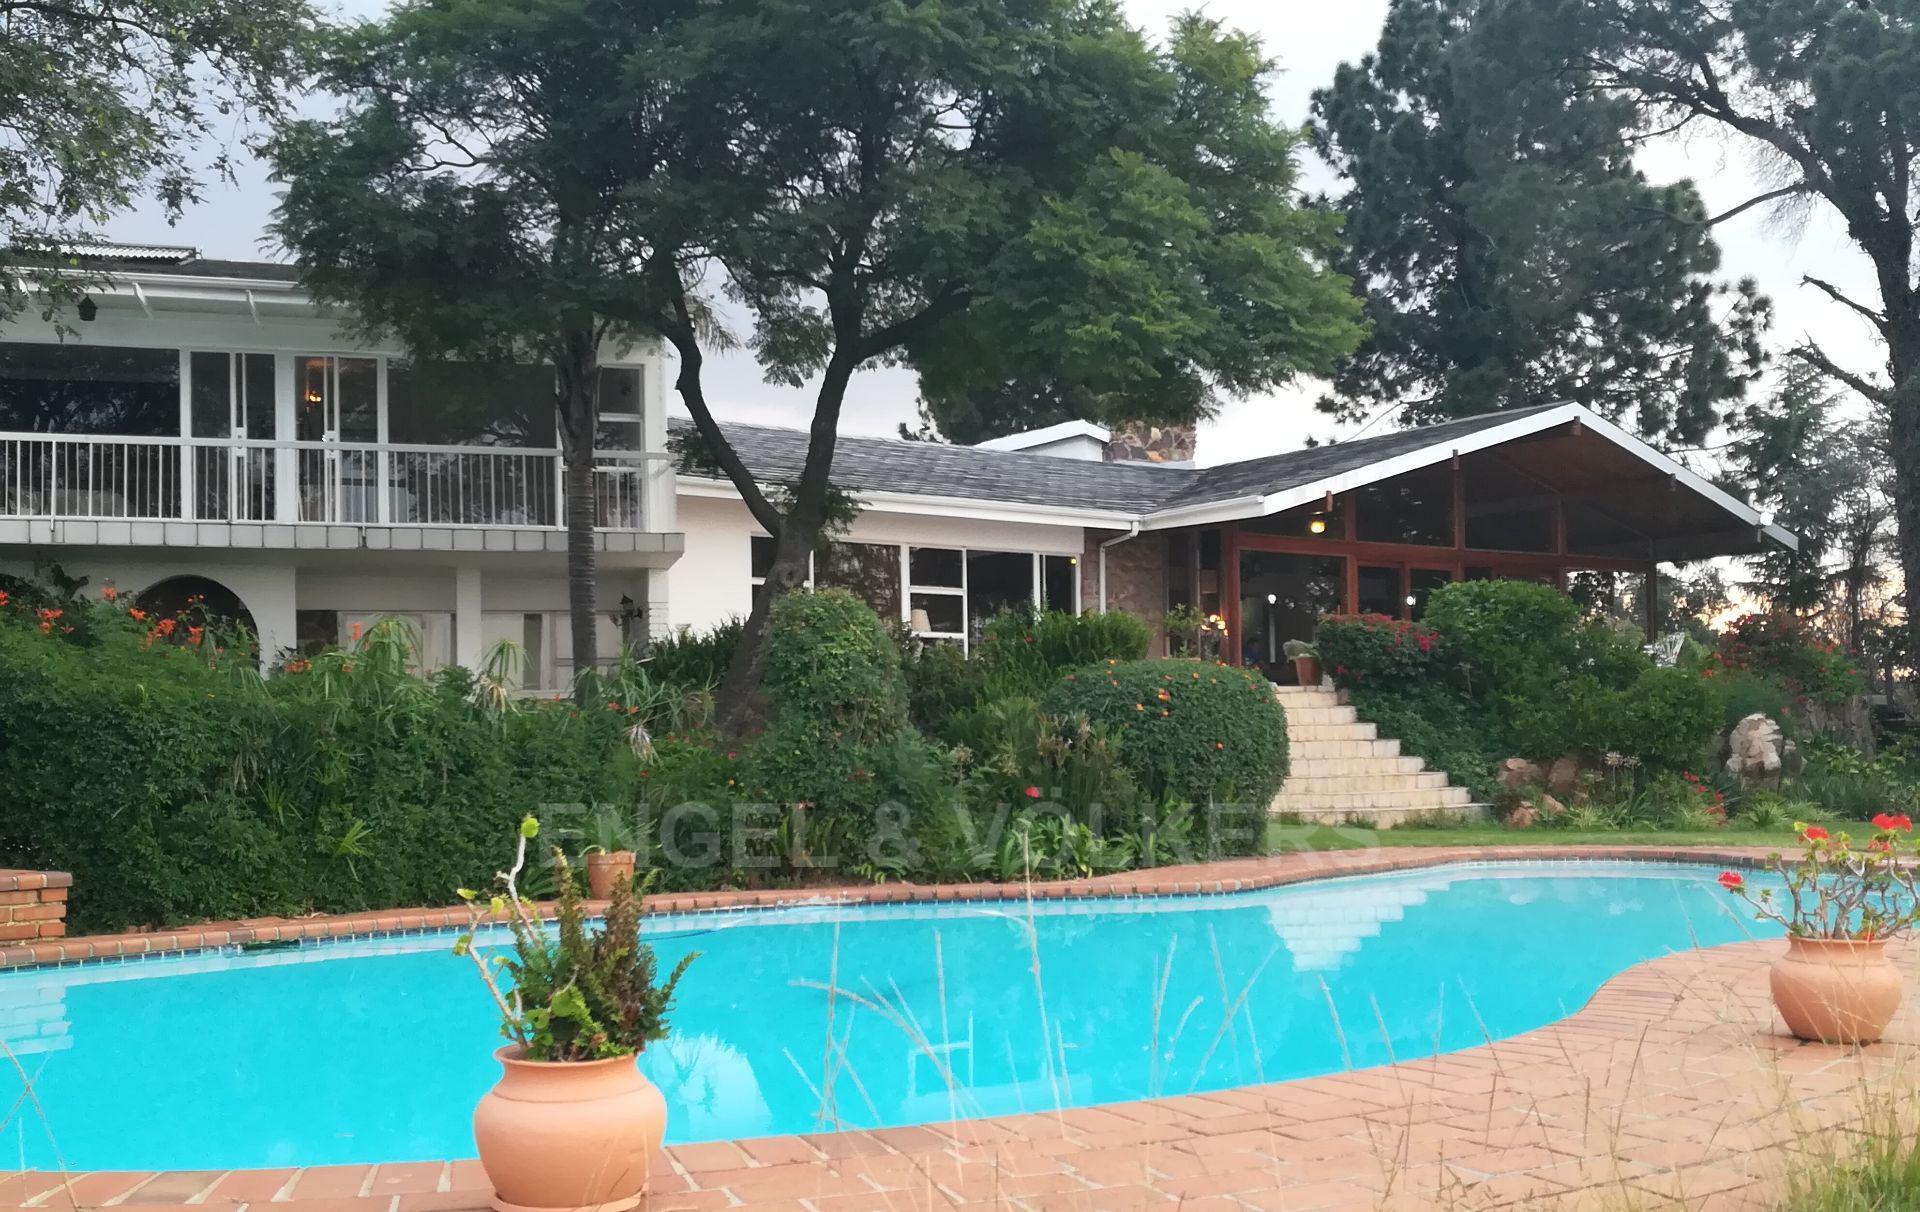 Roodepoort, Helderkruin Property  | Houses For Sale Helderkruin, HELDERKRUIN, House 4 bedrooms property for sale Price:3,299,000